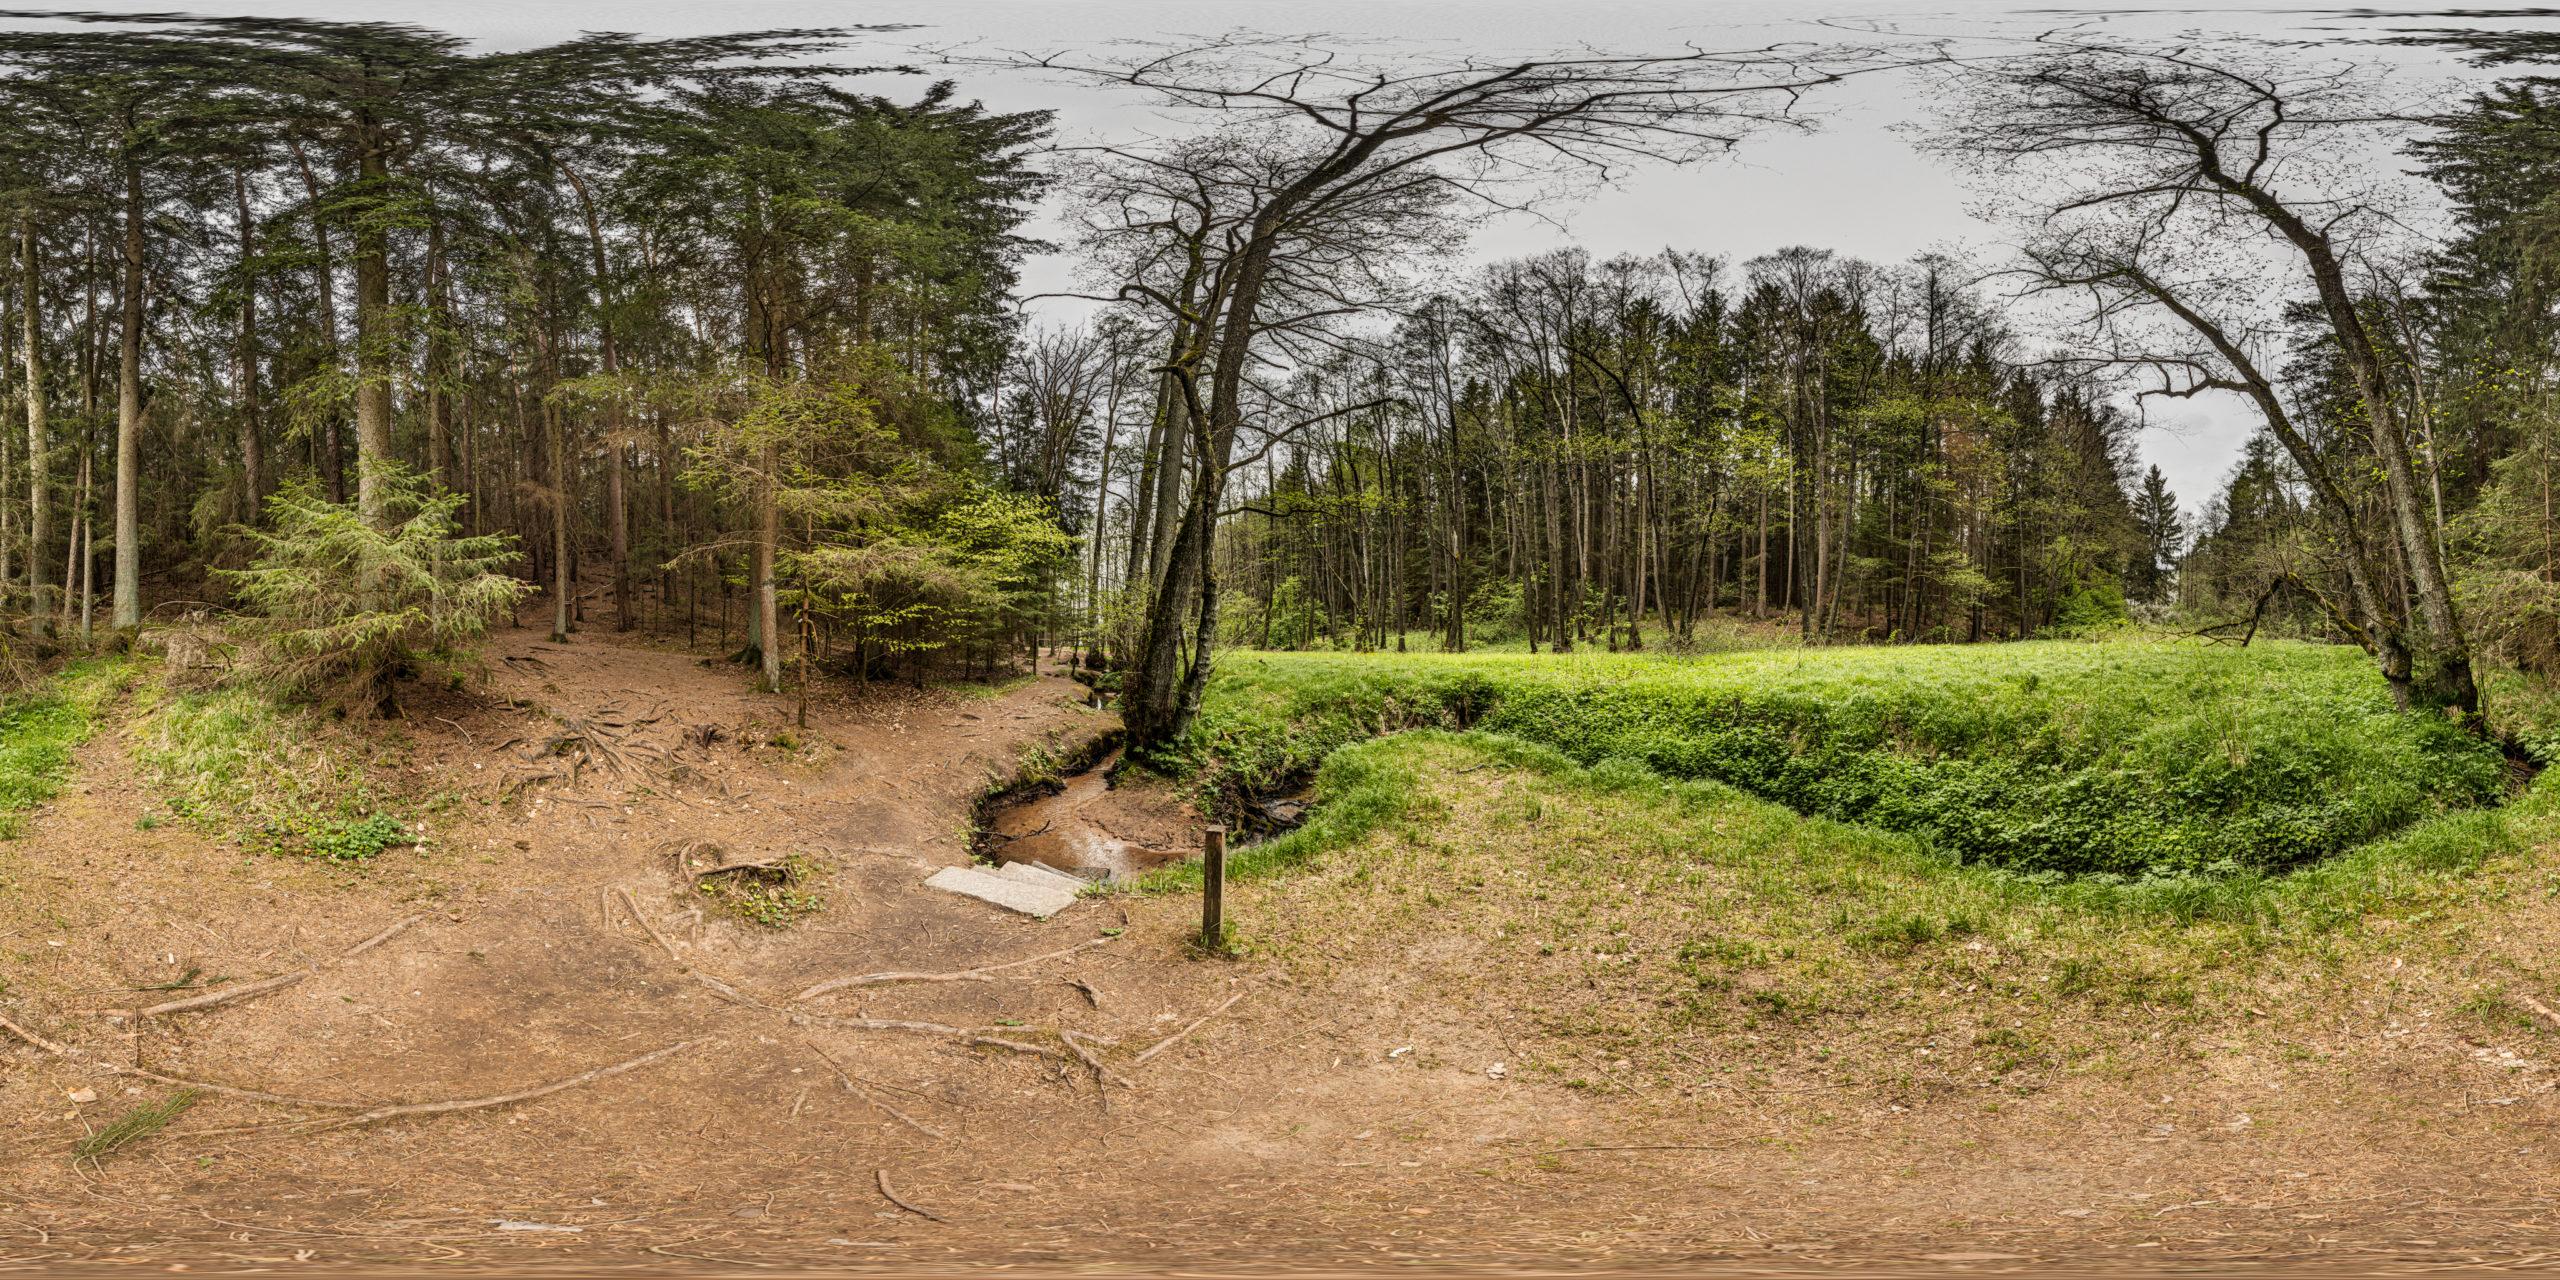 HDRI-Skies-Barefoot-Trail-Brook-Brombachsee